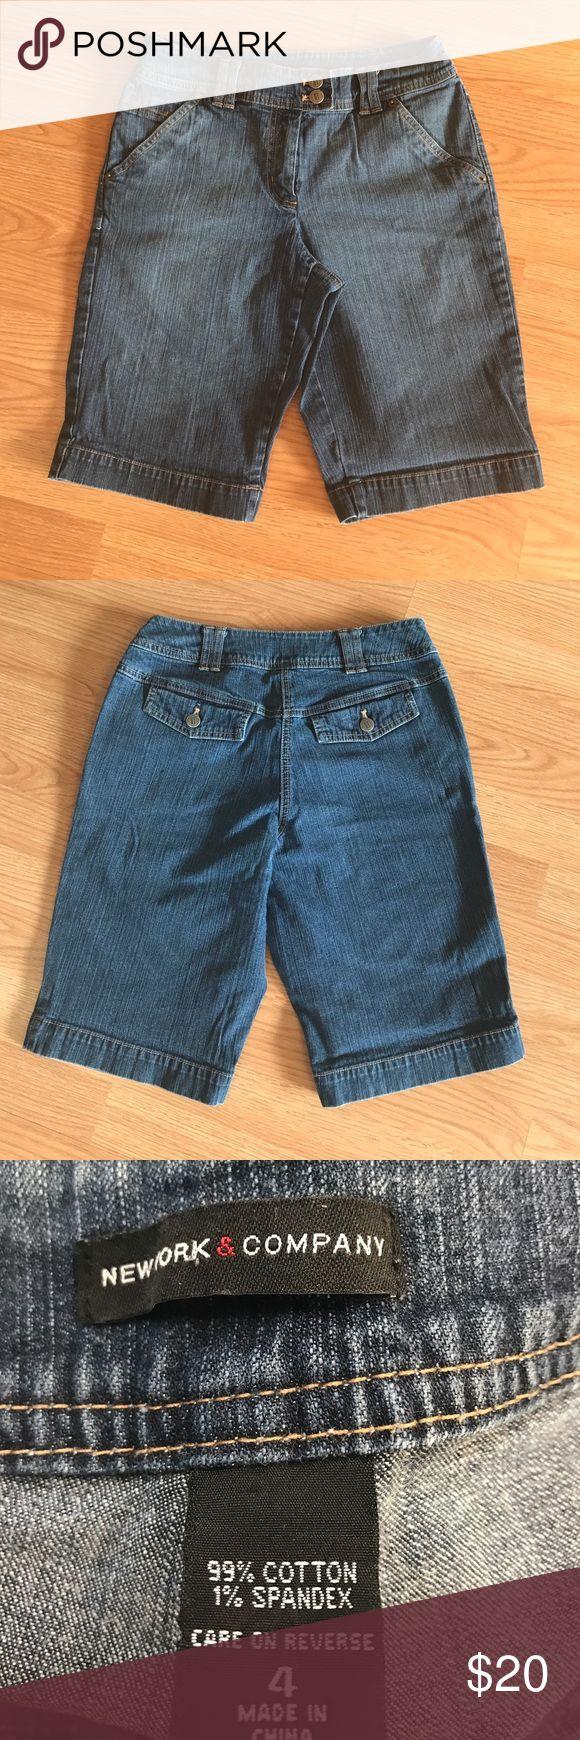 Ladies shorts Ladies denim shorts. Knee length. Has back pockets. Front pockets are faux. 11 inch inseam. 30 inch waist New York & Company Shorts Bermudas